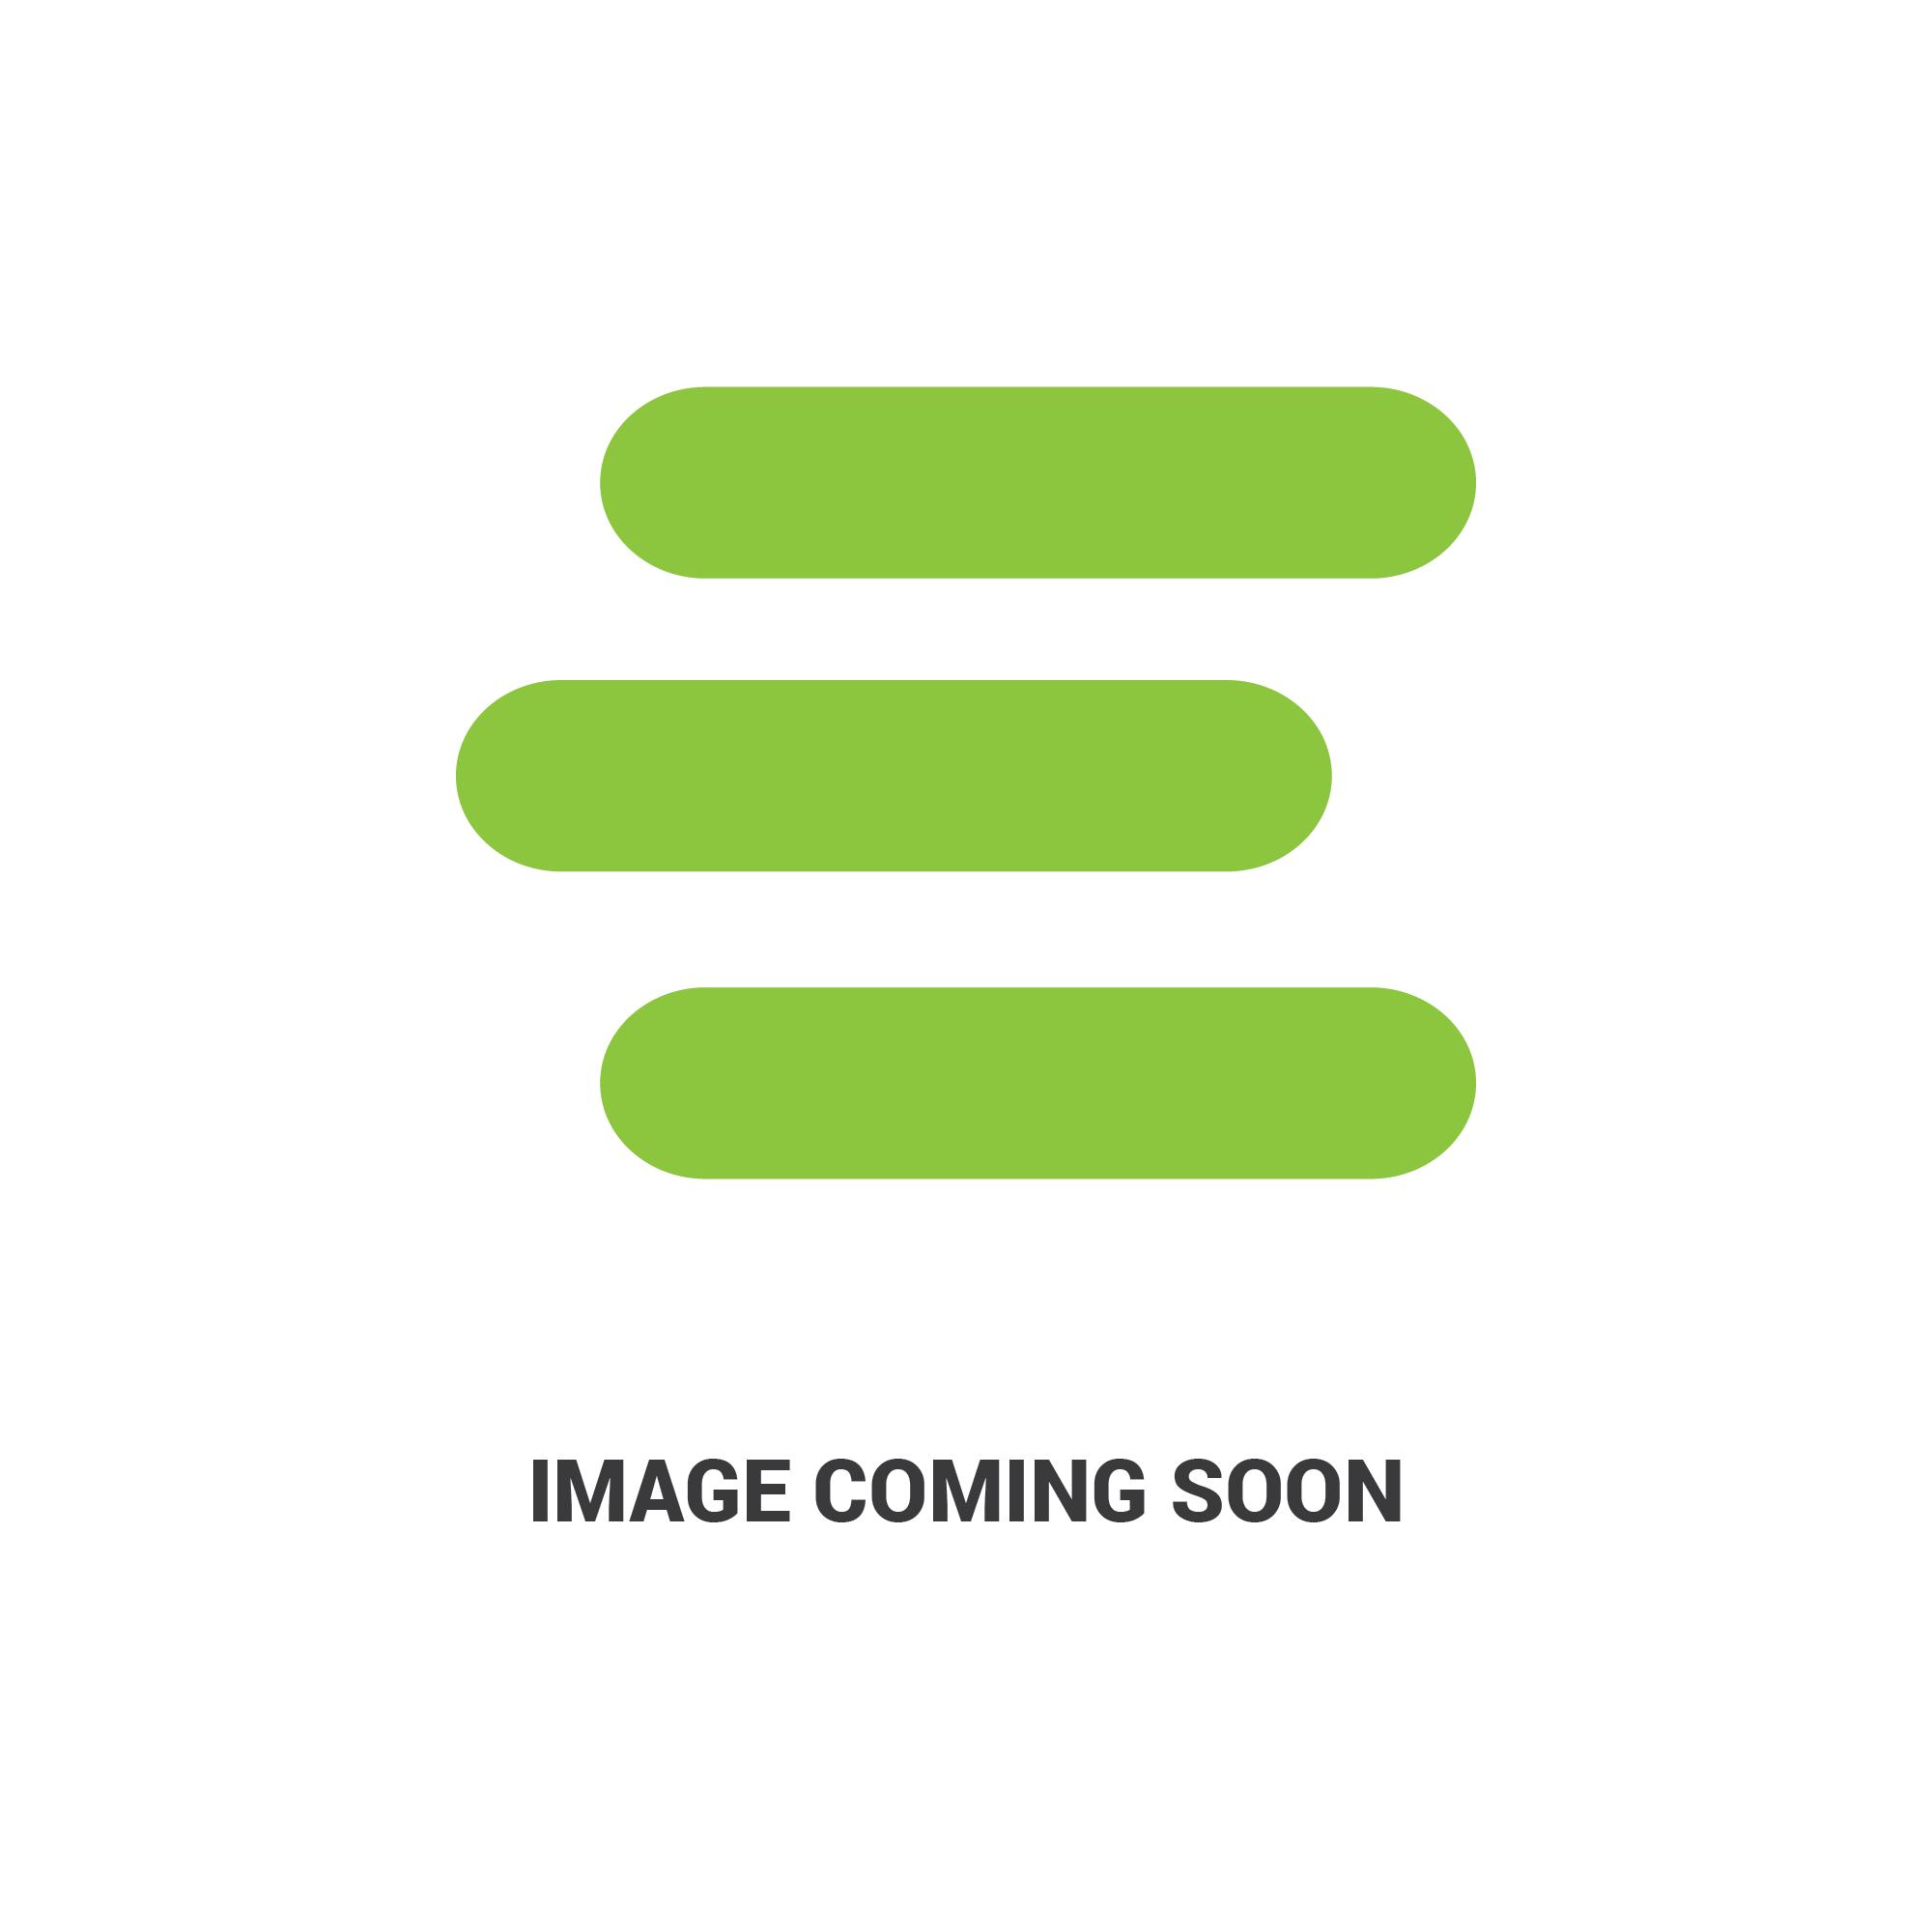 E-33350Aedit 20.jpg